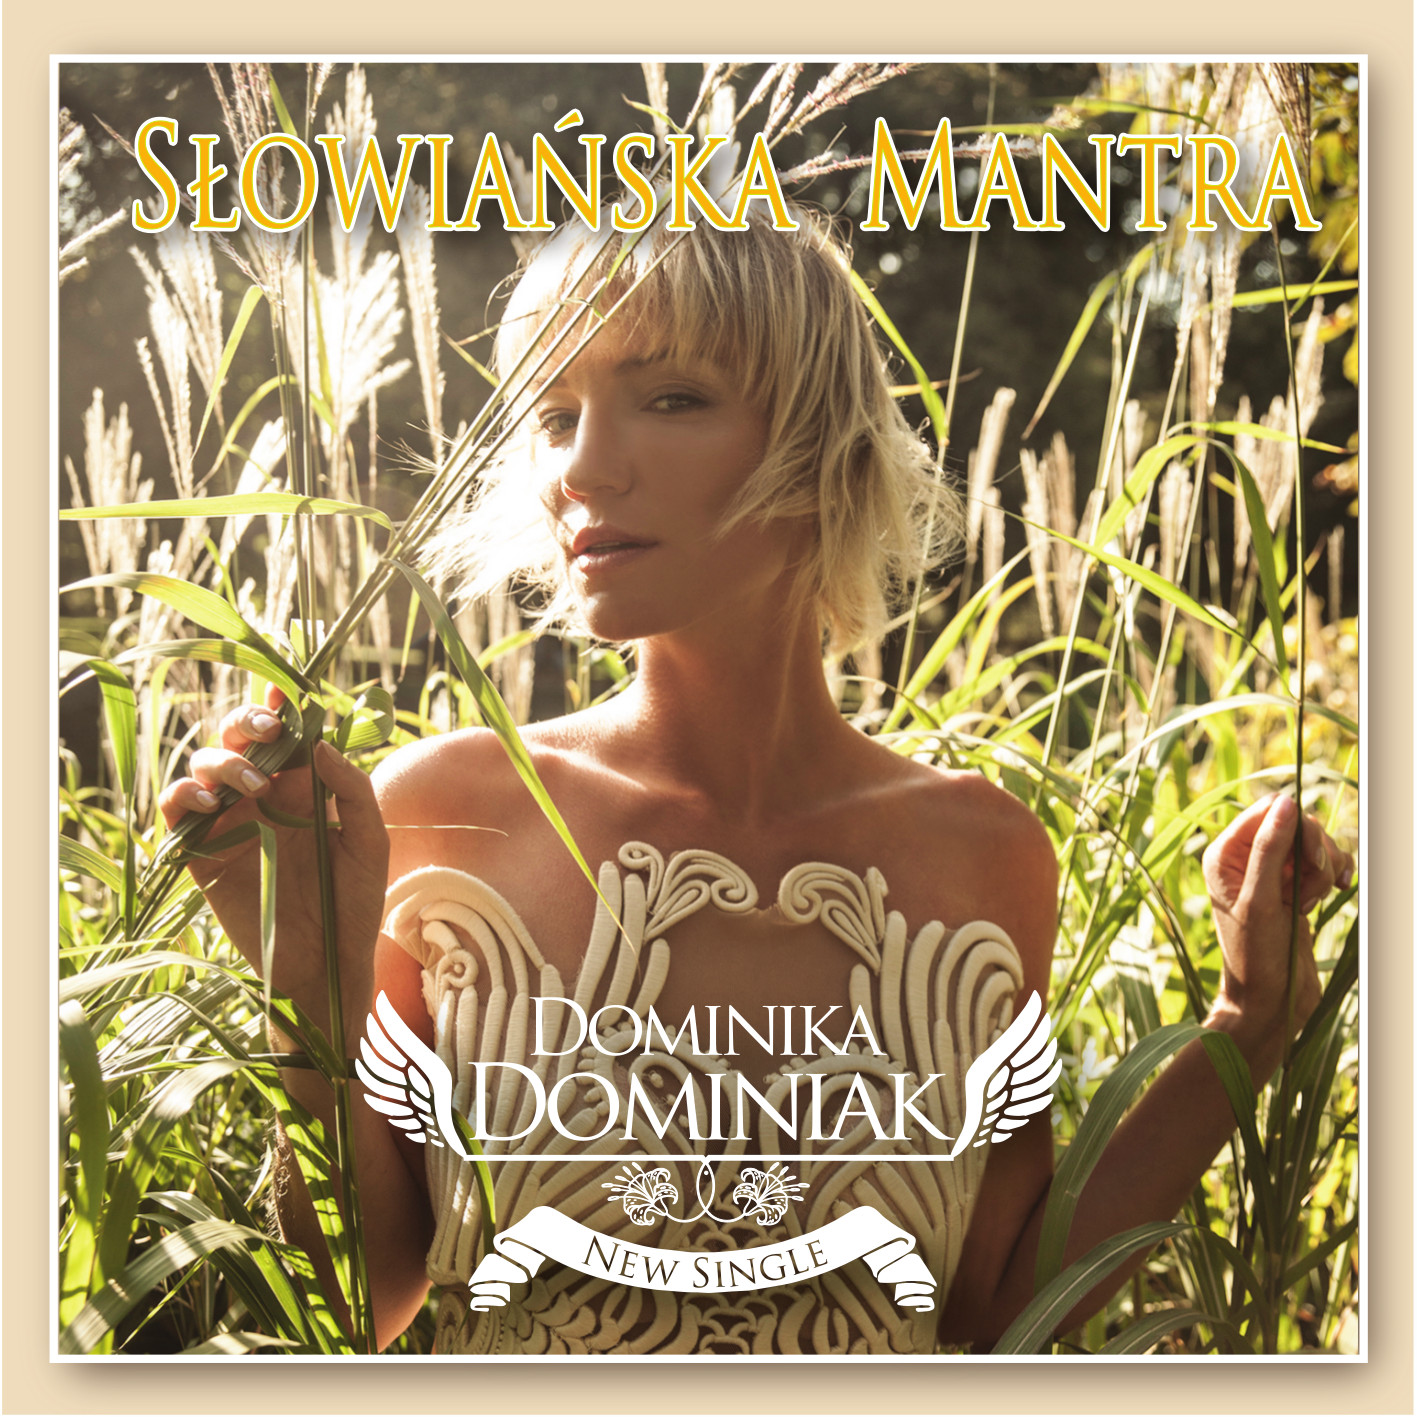 Dominika Dominiak - Mantra Slowianska